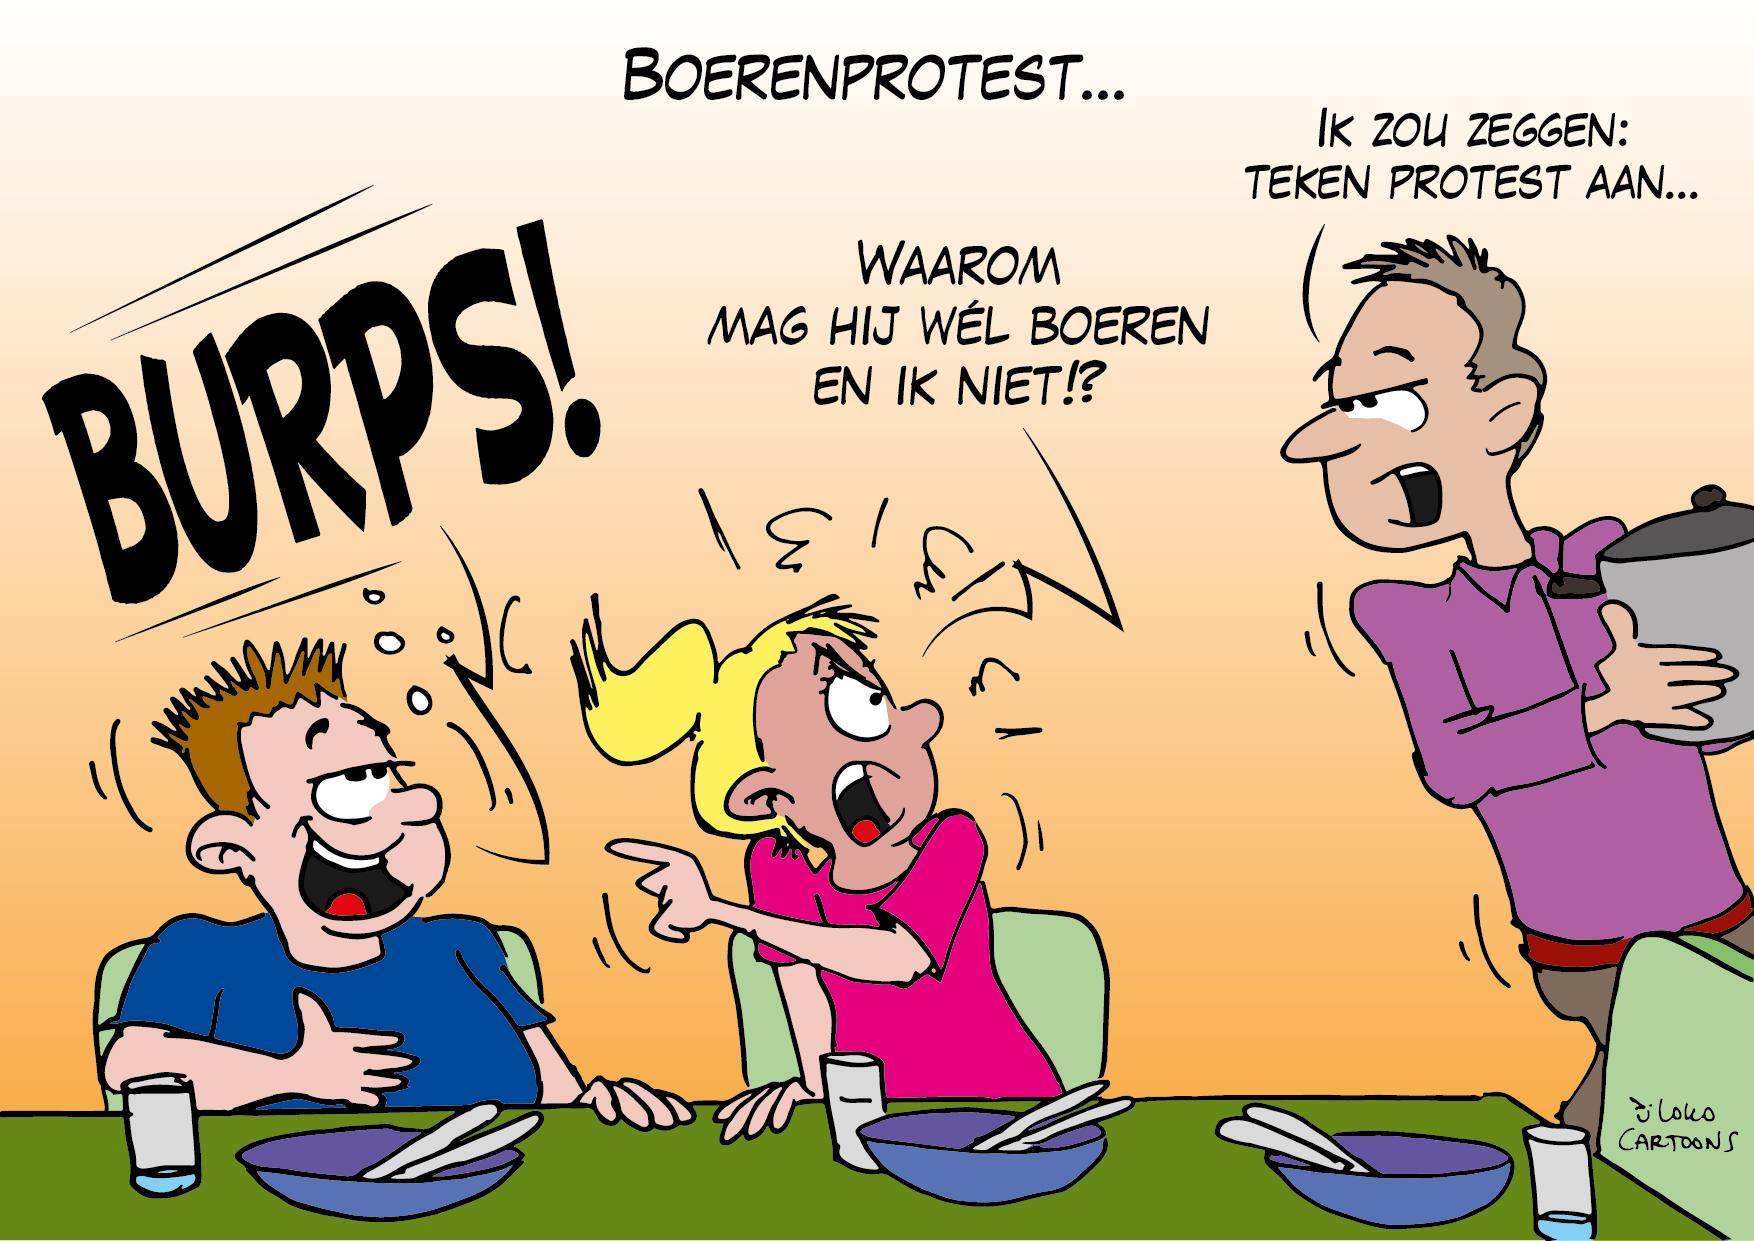 Boerenprotest…